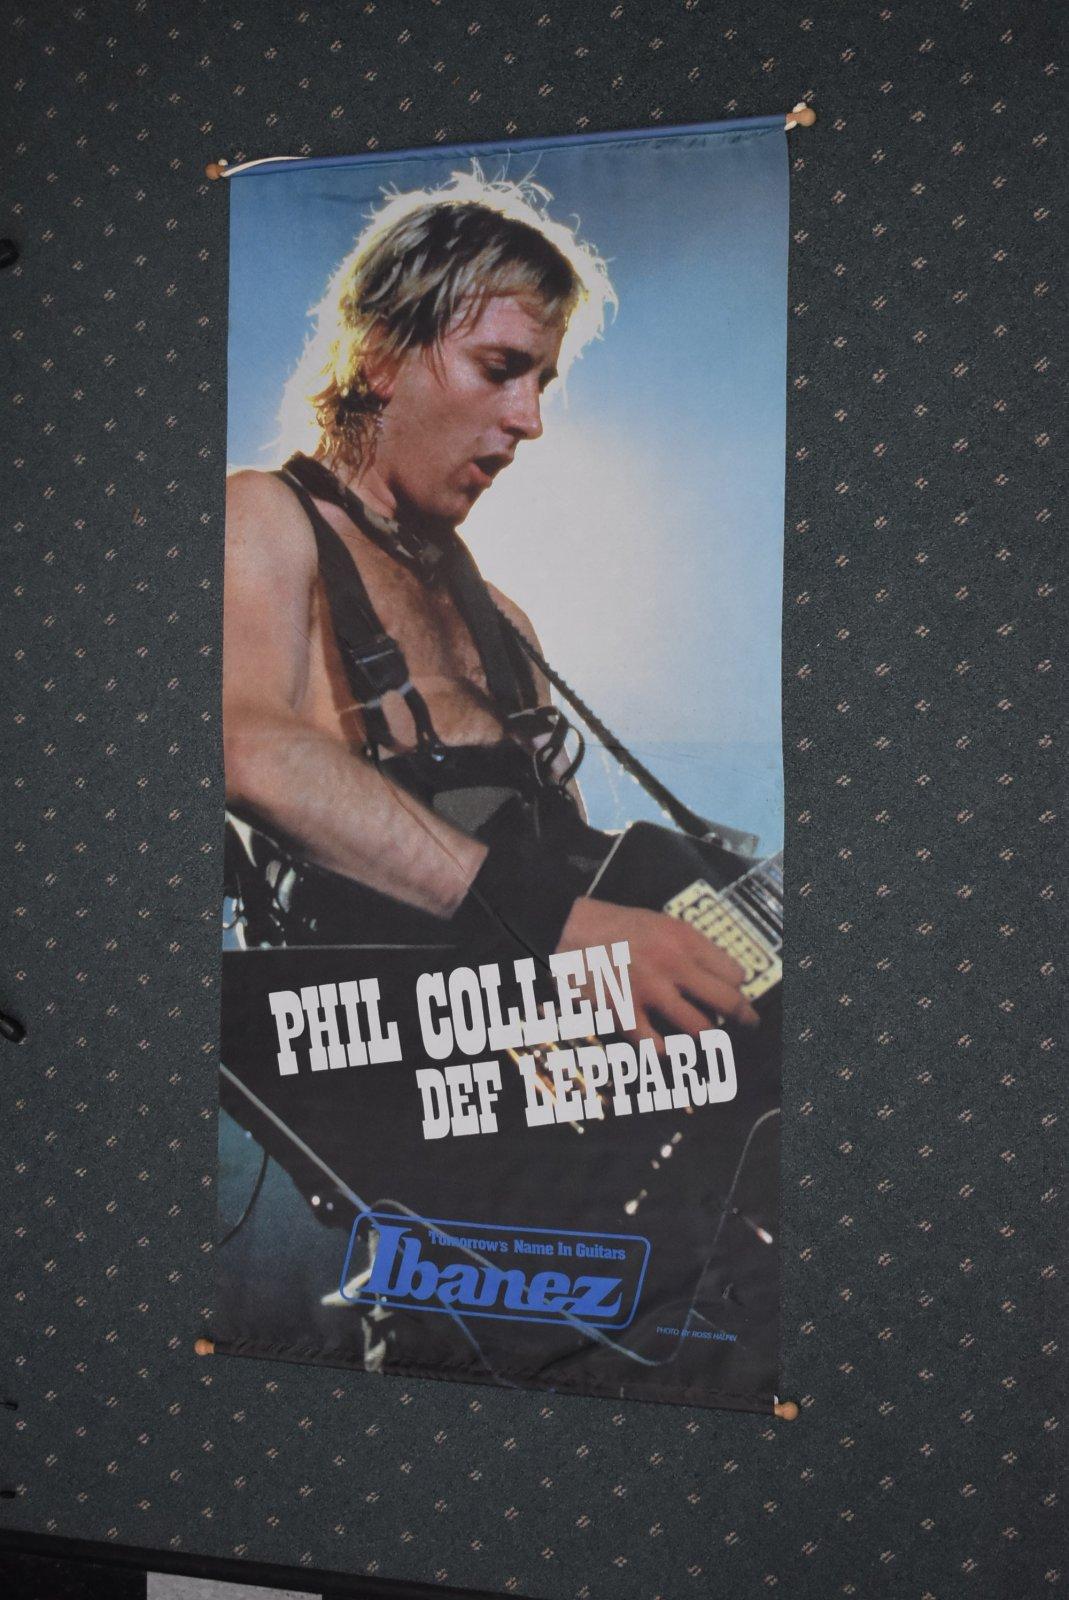 Phil Collen/Def Leppard Ibanez Banner